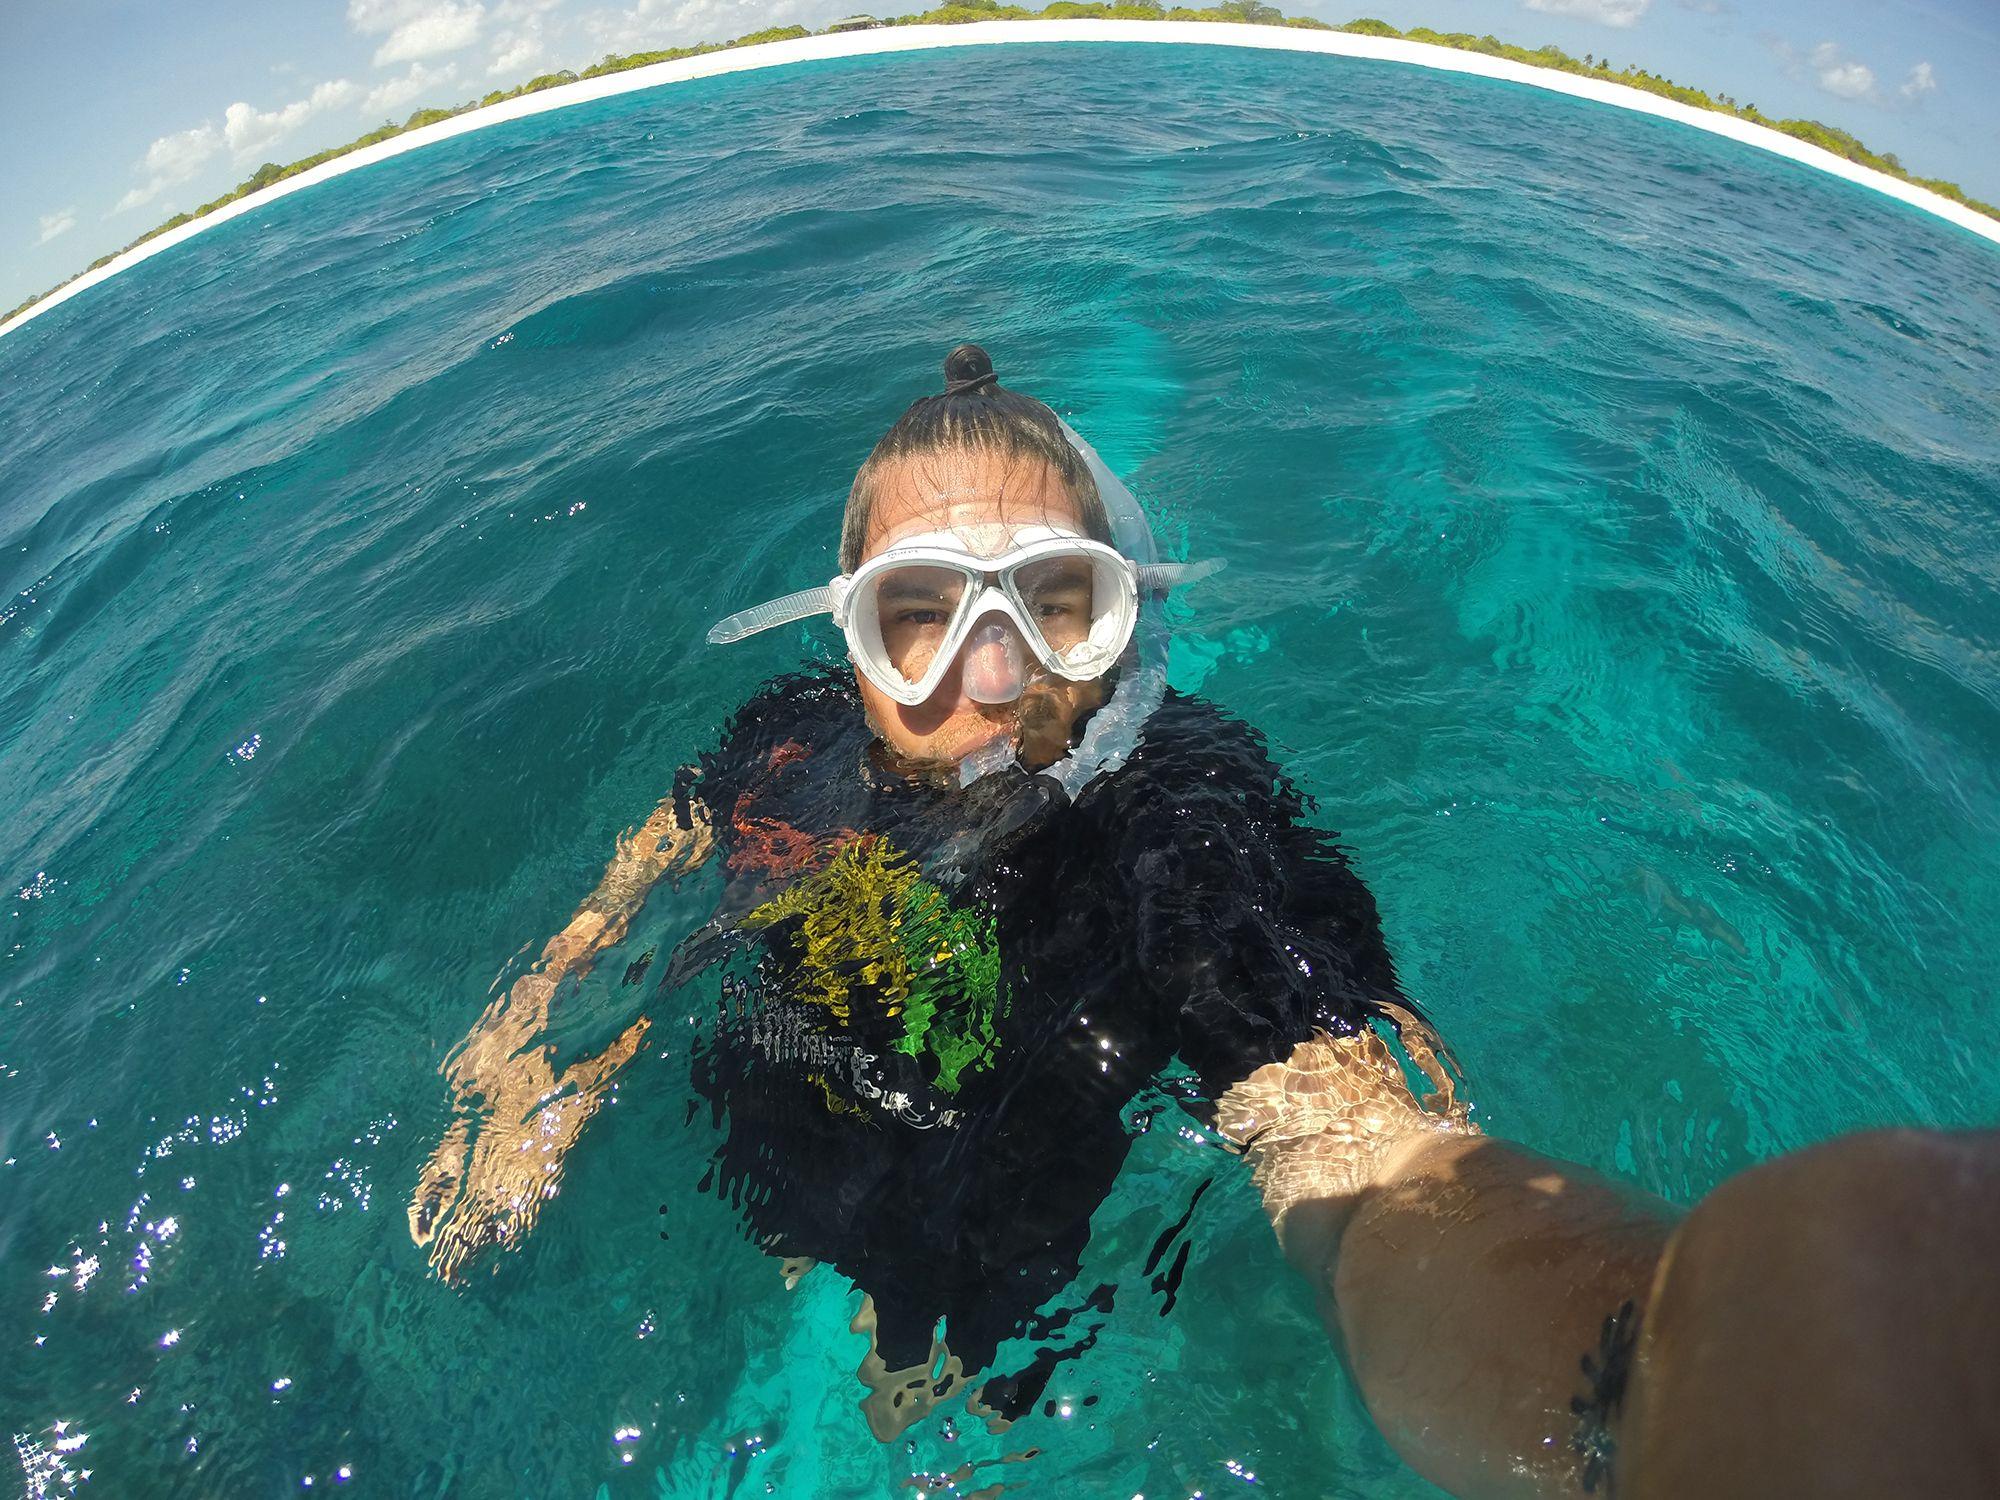 Angelo Villagomez '04 snorkeling